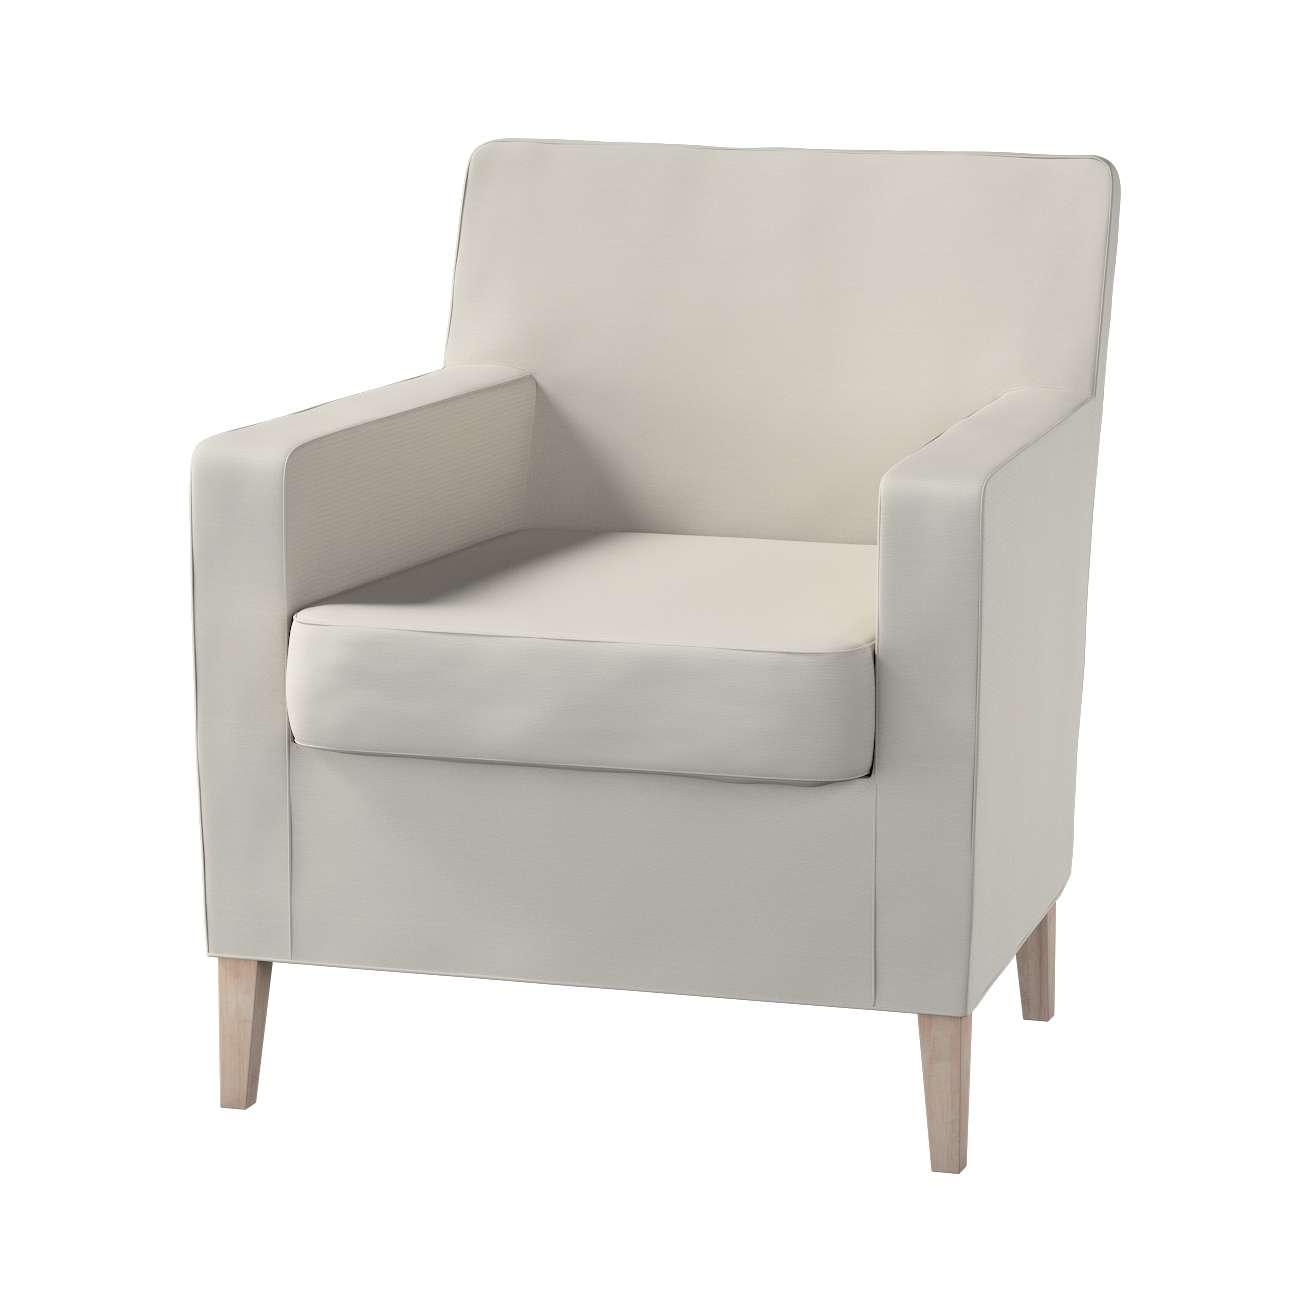 Karlstad tall chair cover, dove grey, 702-31, Karlstad ...